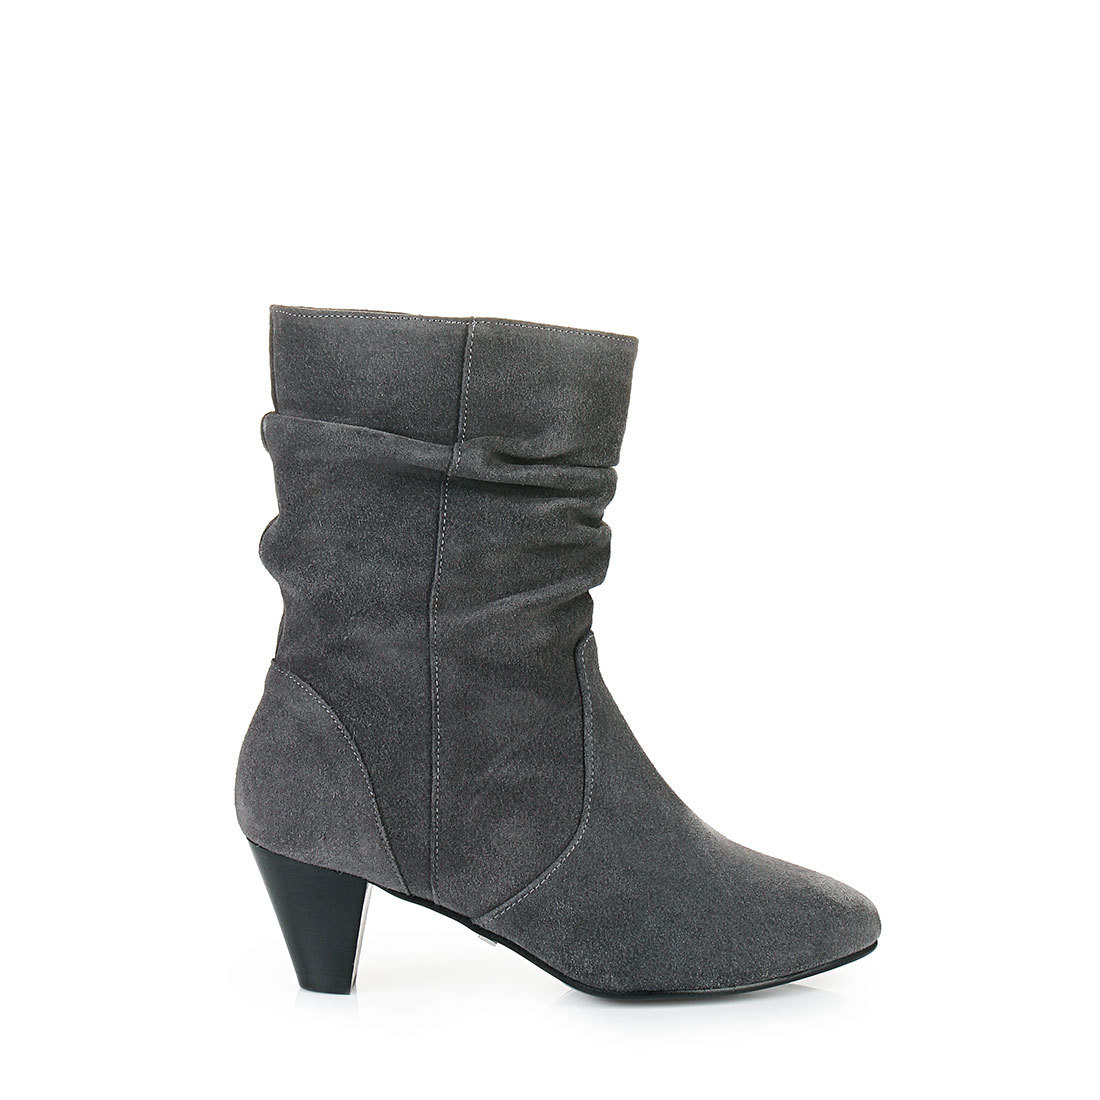 buffalo ankle boots in dark grey buy online in buffalo online shop buffalo. Black Bedroom Furniture Sets. Home Design Ideas